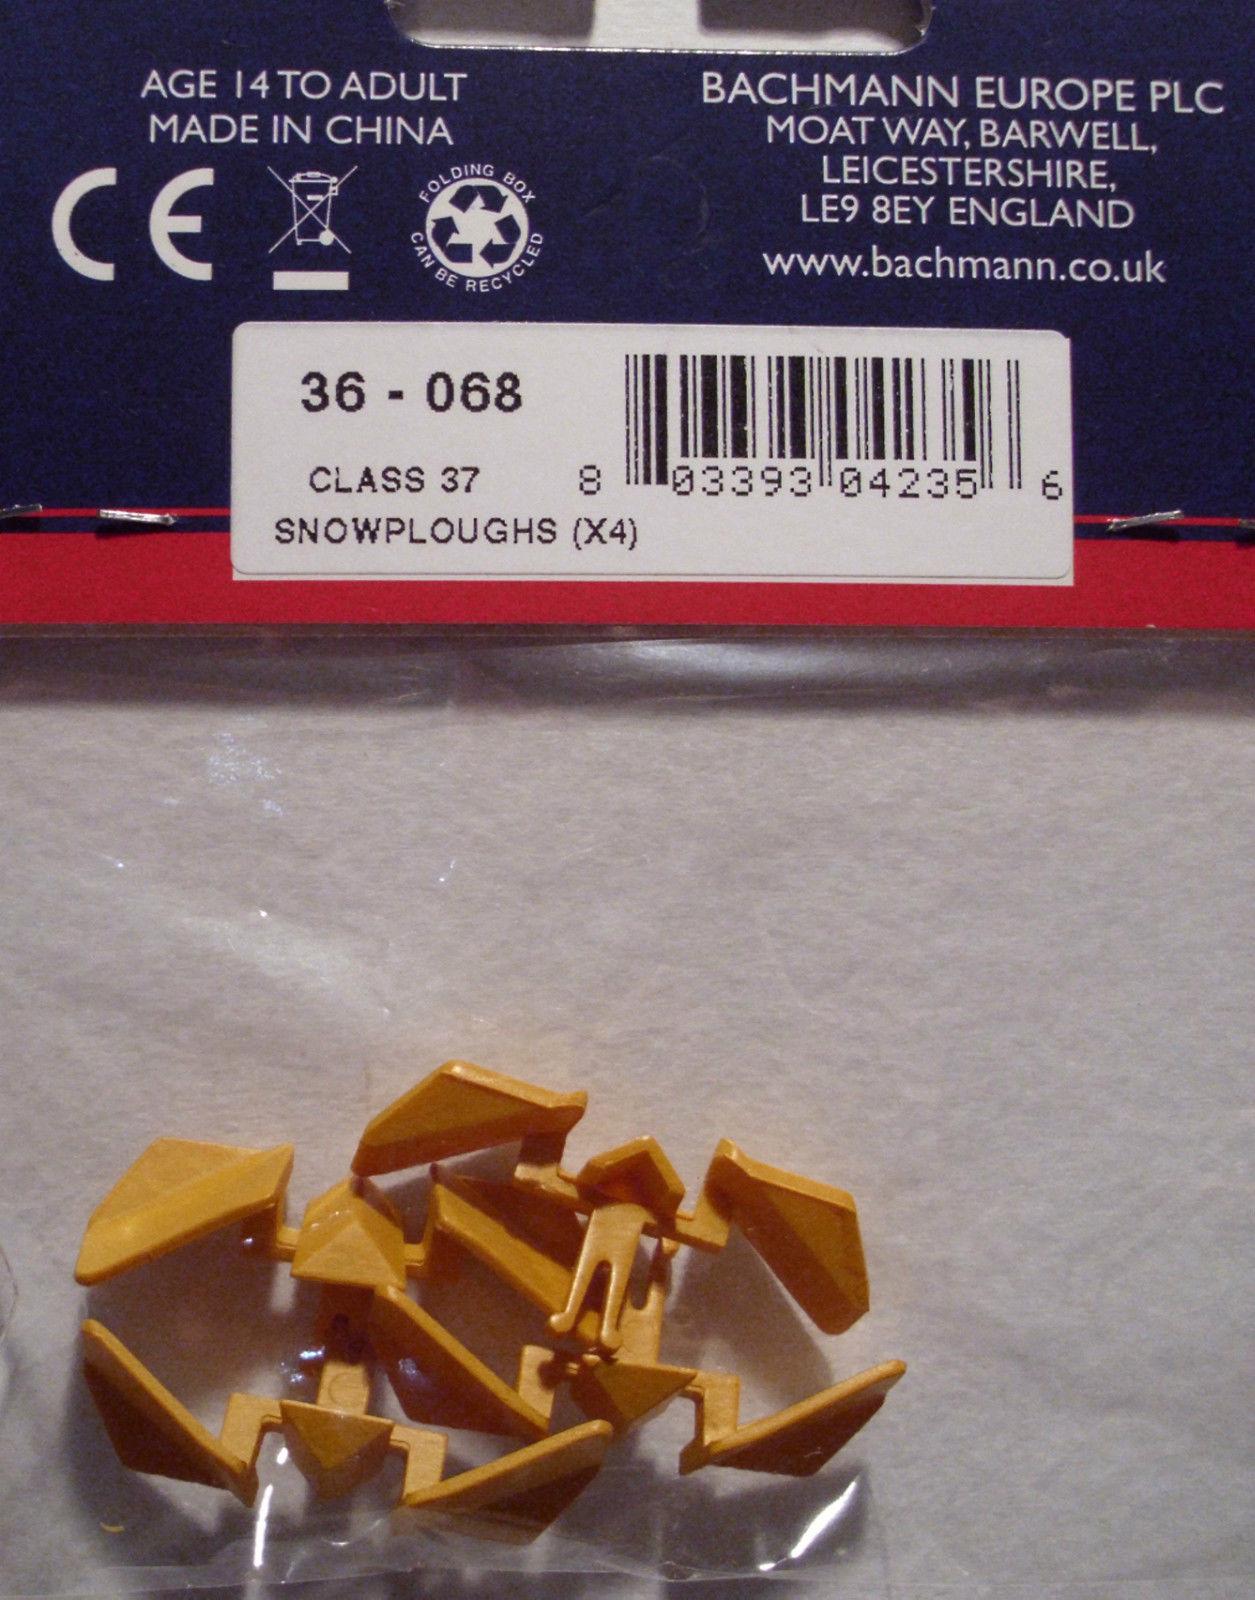 Bachmann 36-068 - Spare Parts - 4 x Class 37 Yellow Snowploughs - 1st Class  Post